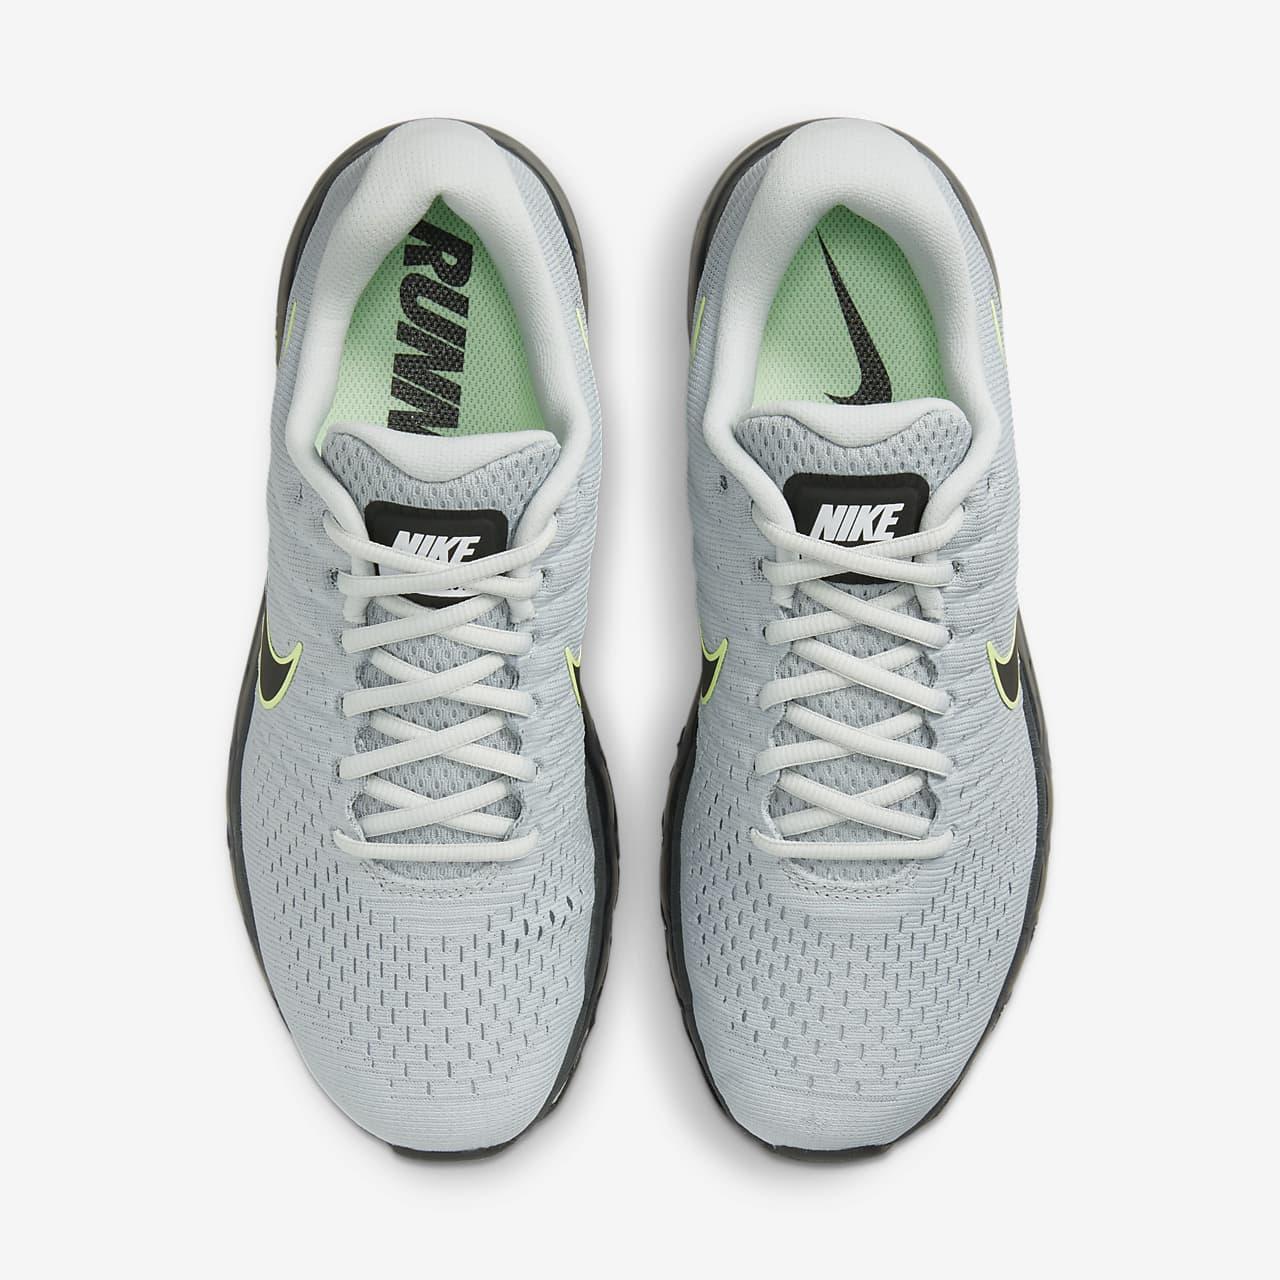 Calzado para hombre Nike Air Max 2017